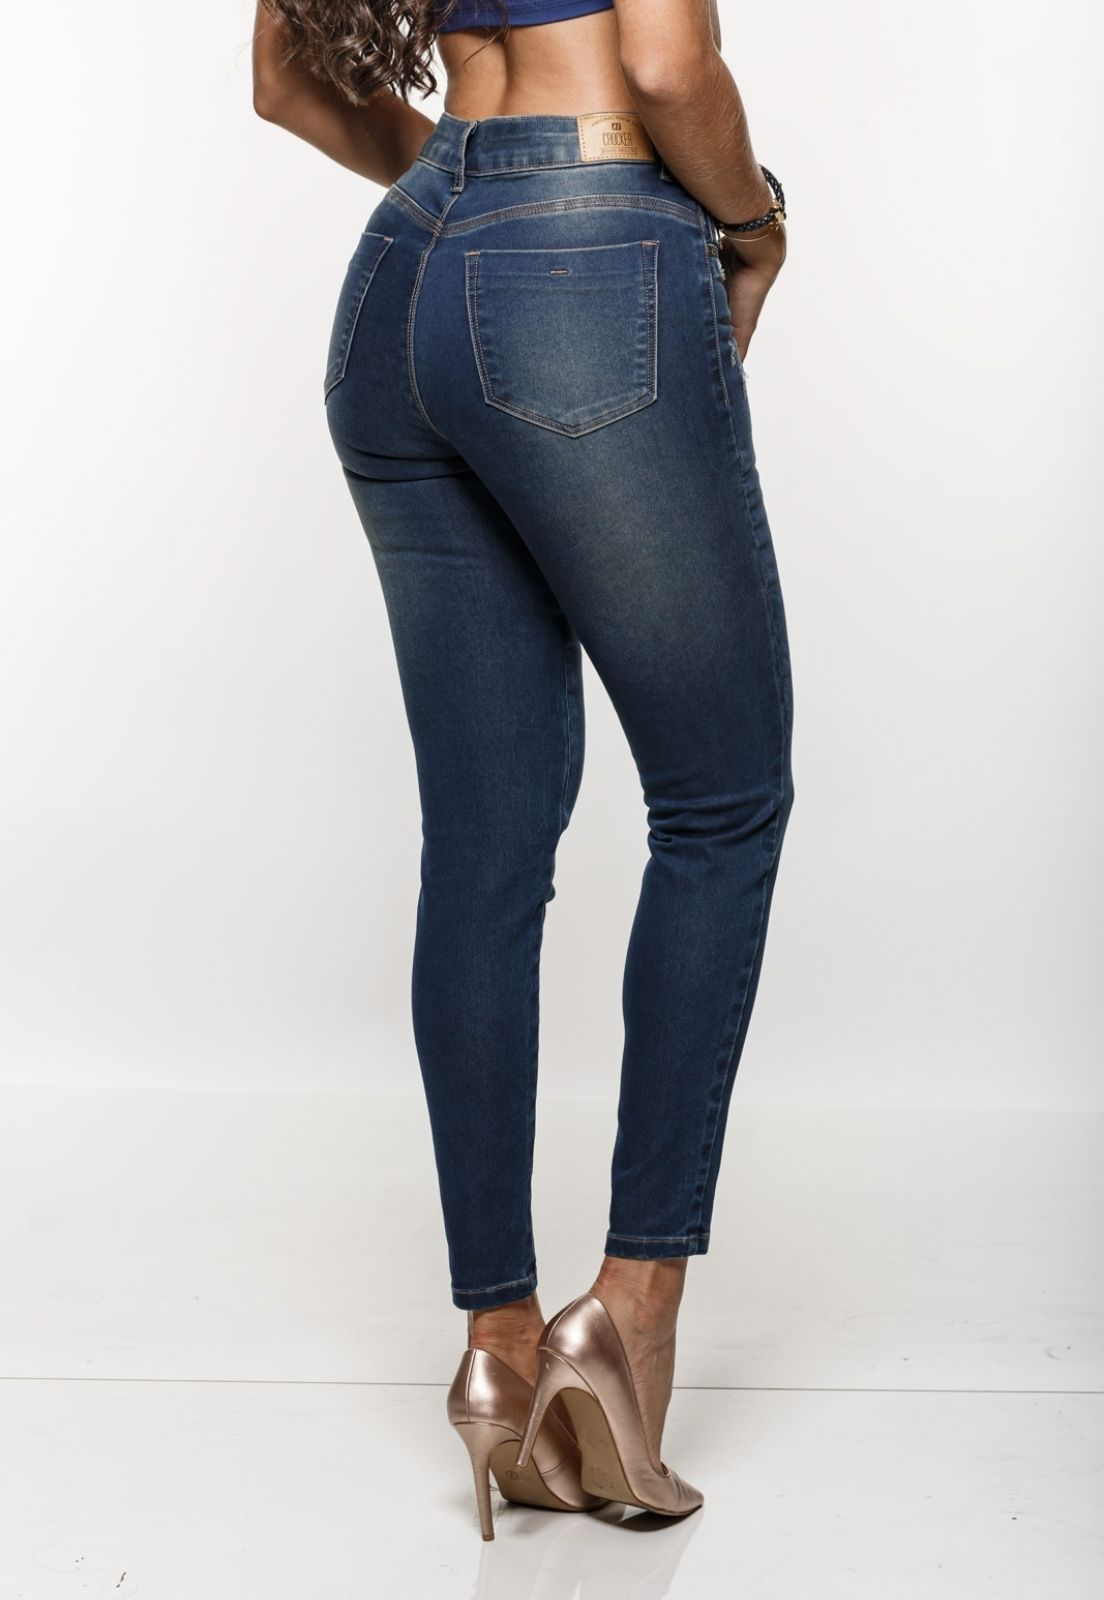 Cigarrete Jeans Feminina Crocker - 48104  - CROCKER JEANS